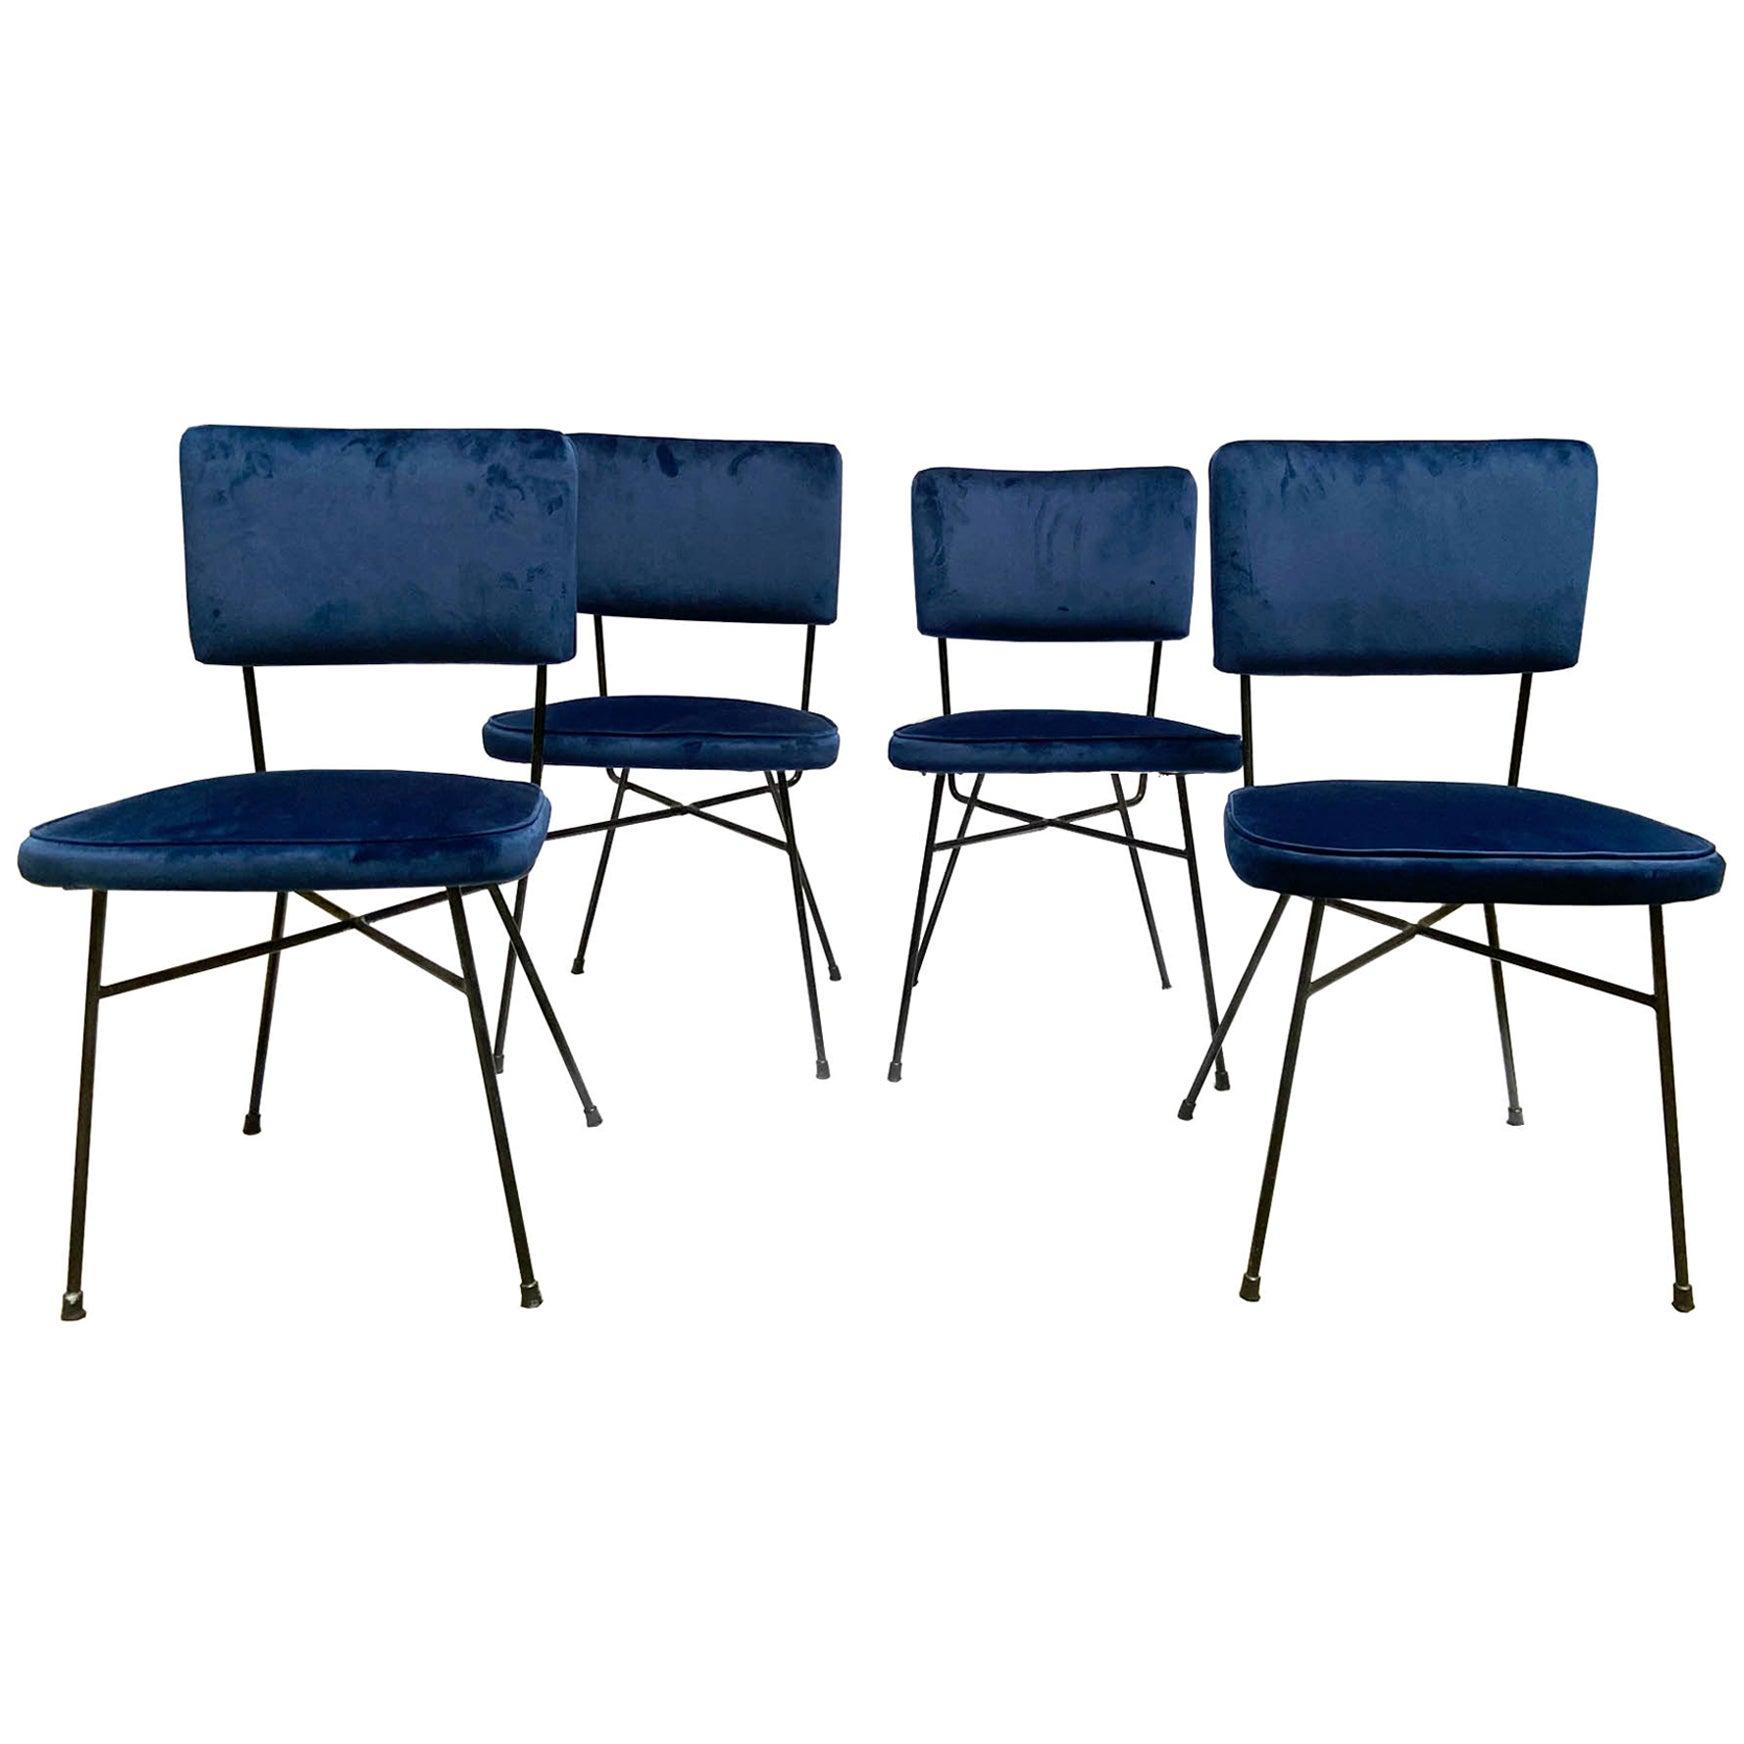 "Studio BBPR for Arflex ""Elettra"" Chairs, Italy, 1953"